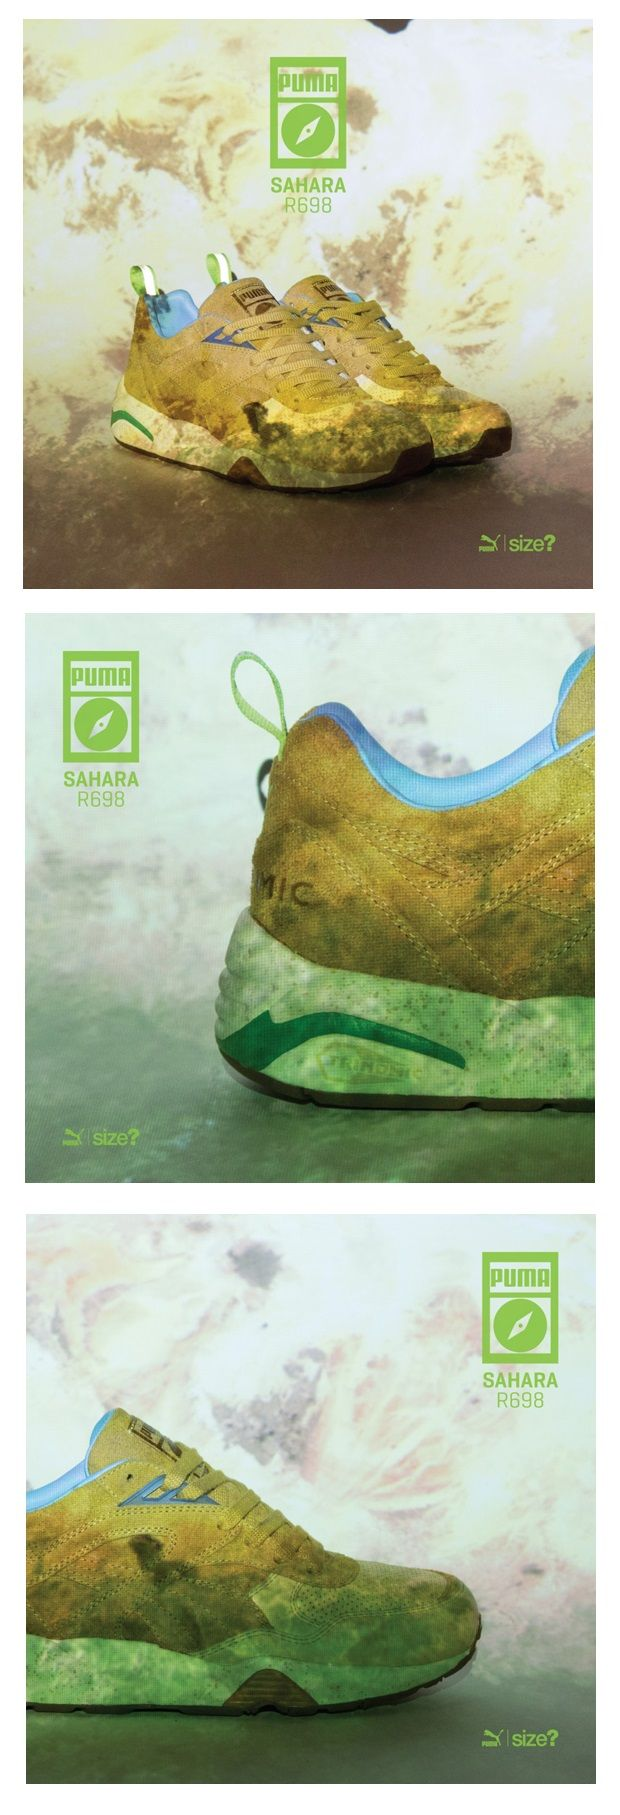 nouveau produit f1b1f 9279f Size? x Puma R698 Wilderness - Sahara pack | Sneakers: Puma ...